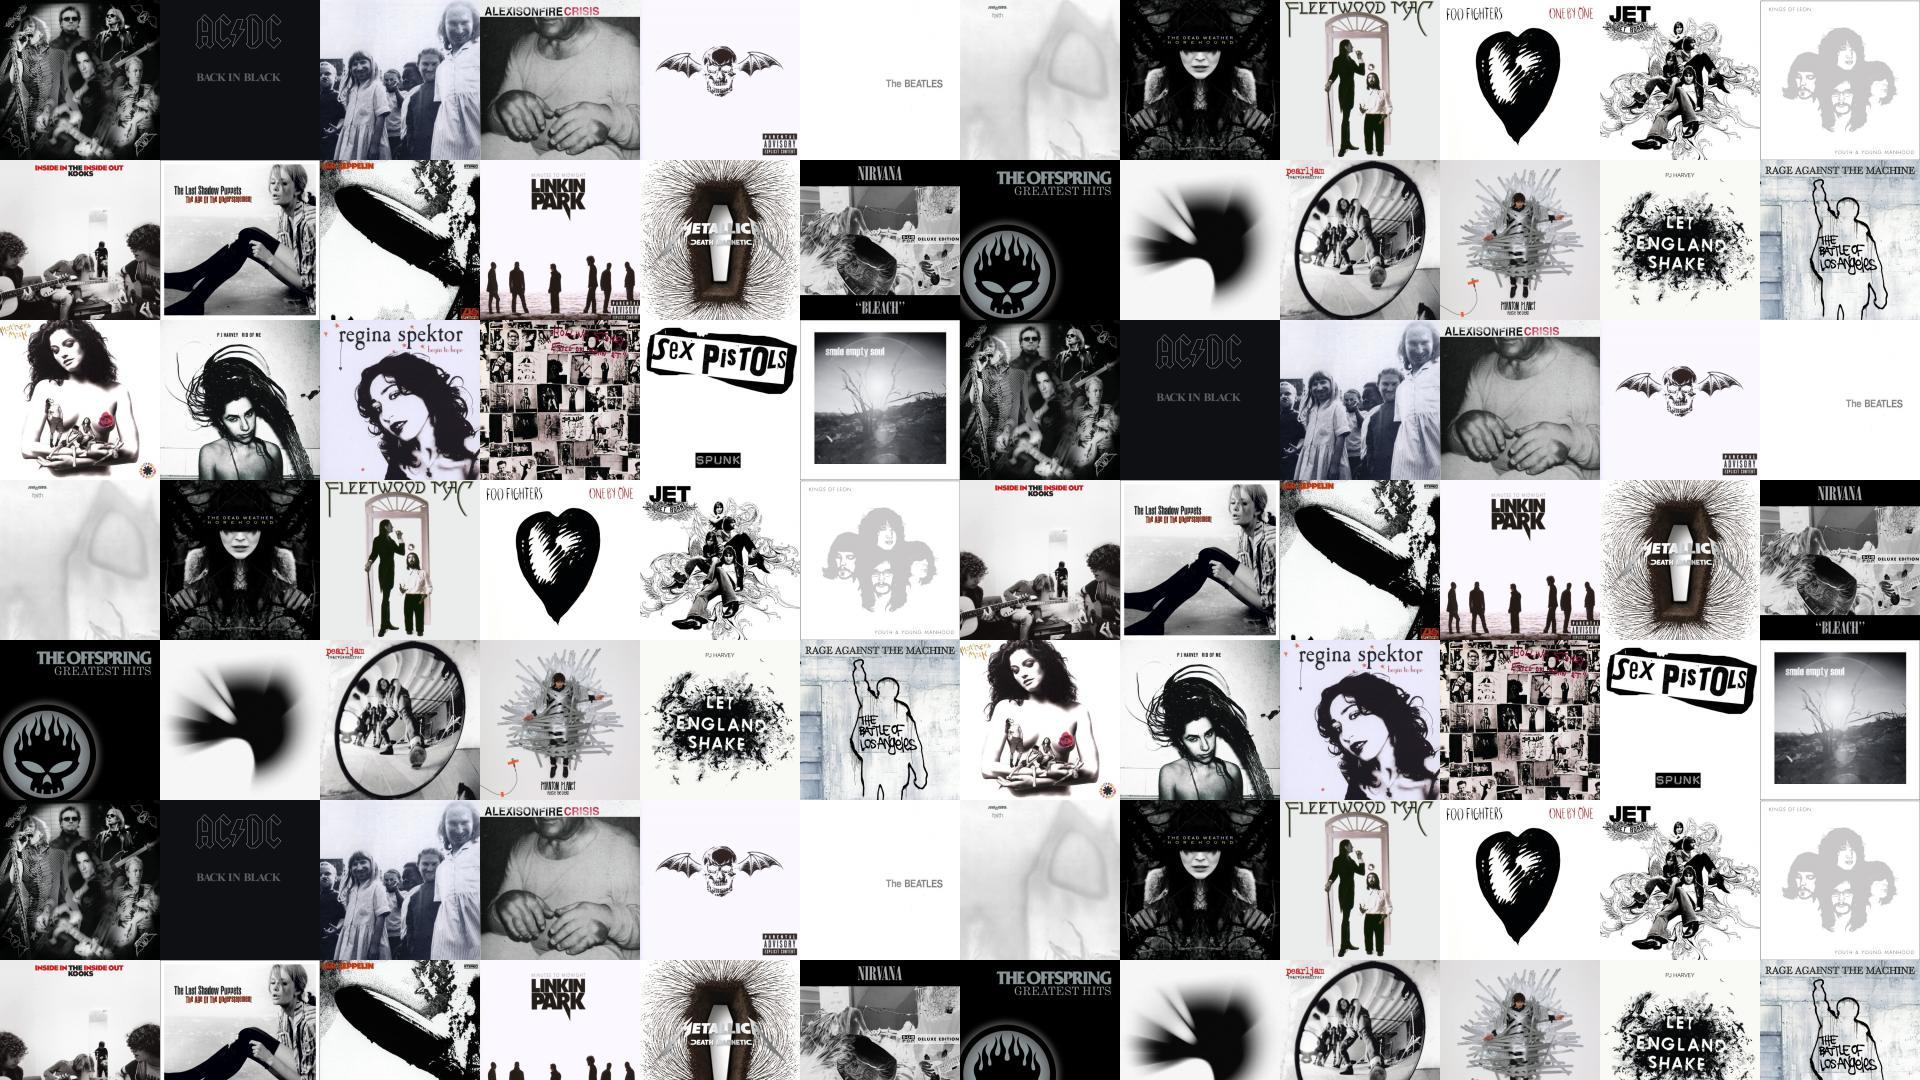 Aerosmith Aerosmith Acdc Back In Black Aphex Twin Wallpaper Tiled